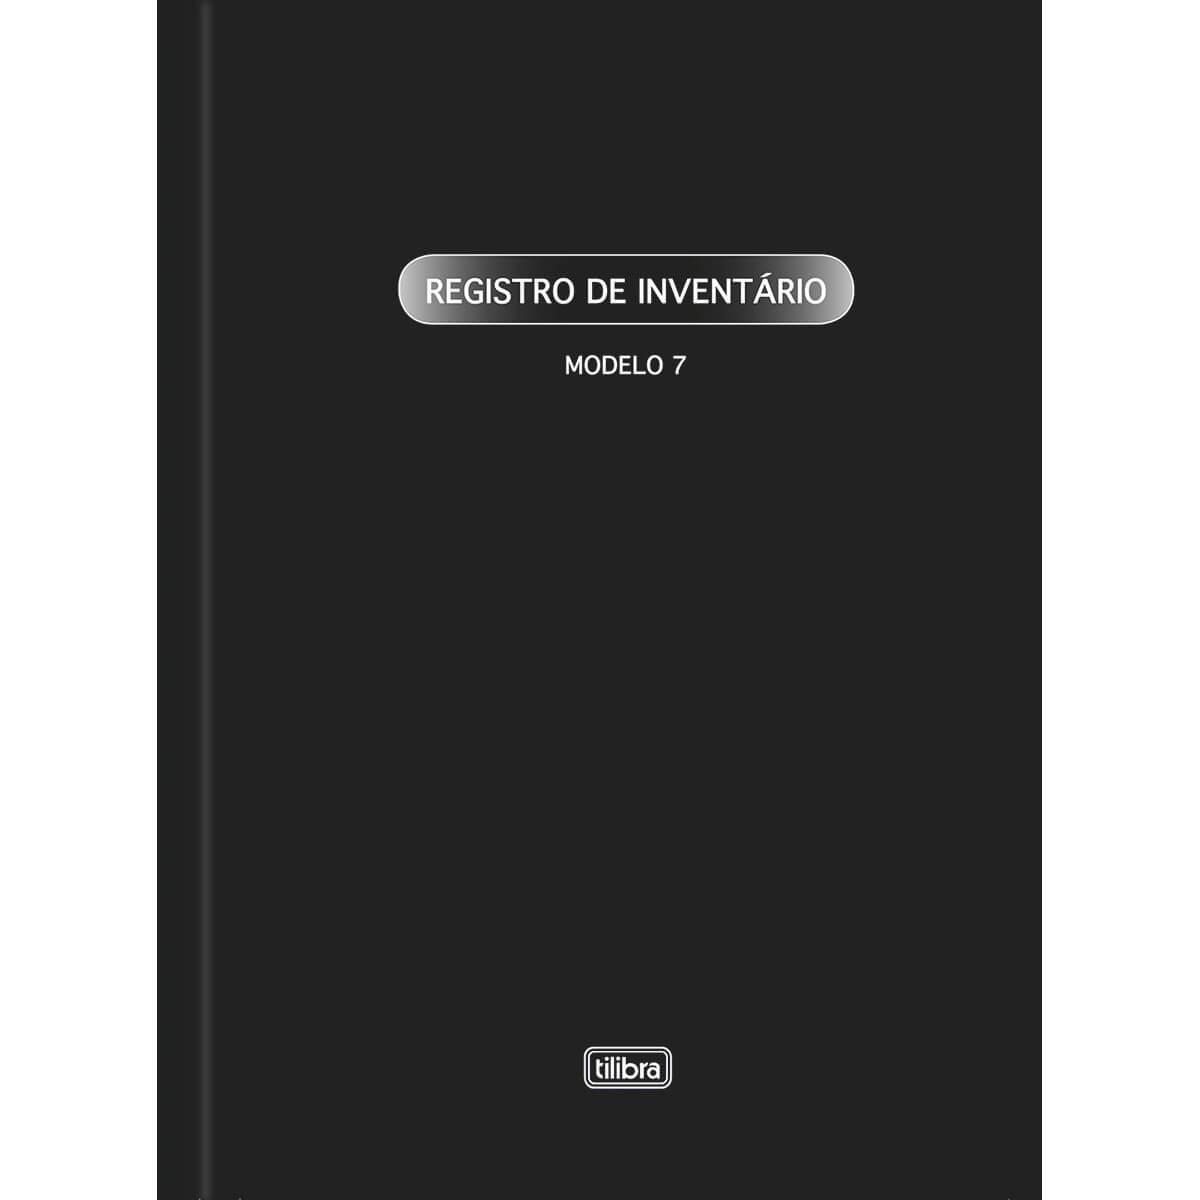 LIVRO REGISTRO DE INVENTARIO MODELO 7 - TILIBRA